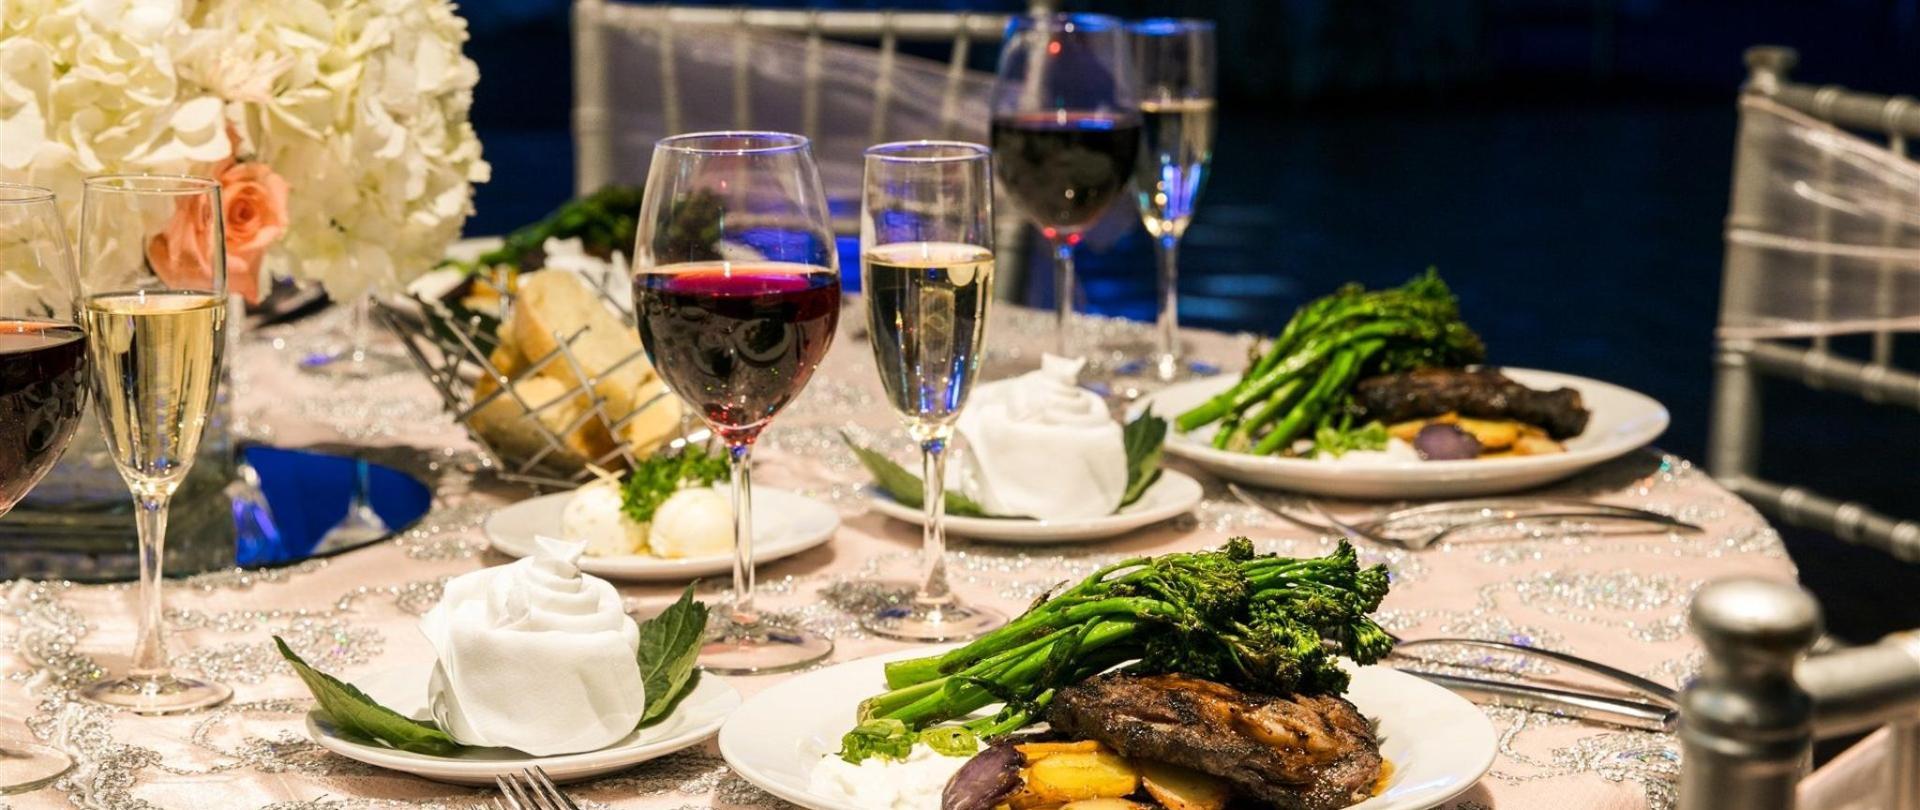 2017-01-26_clarion_banquetroom-arcticaurora-food-0352x-edit.jpg